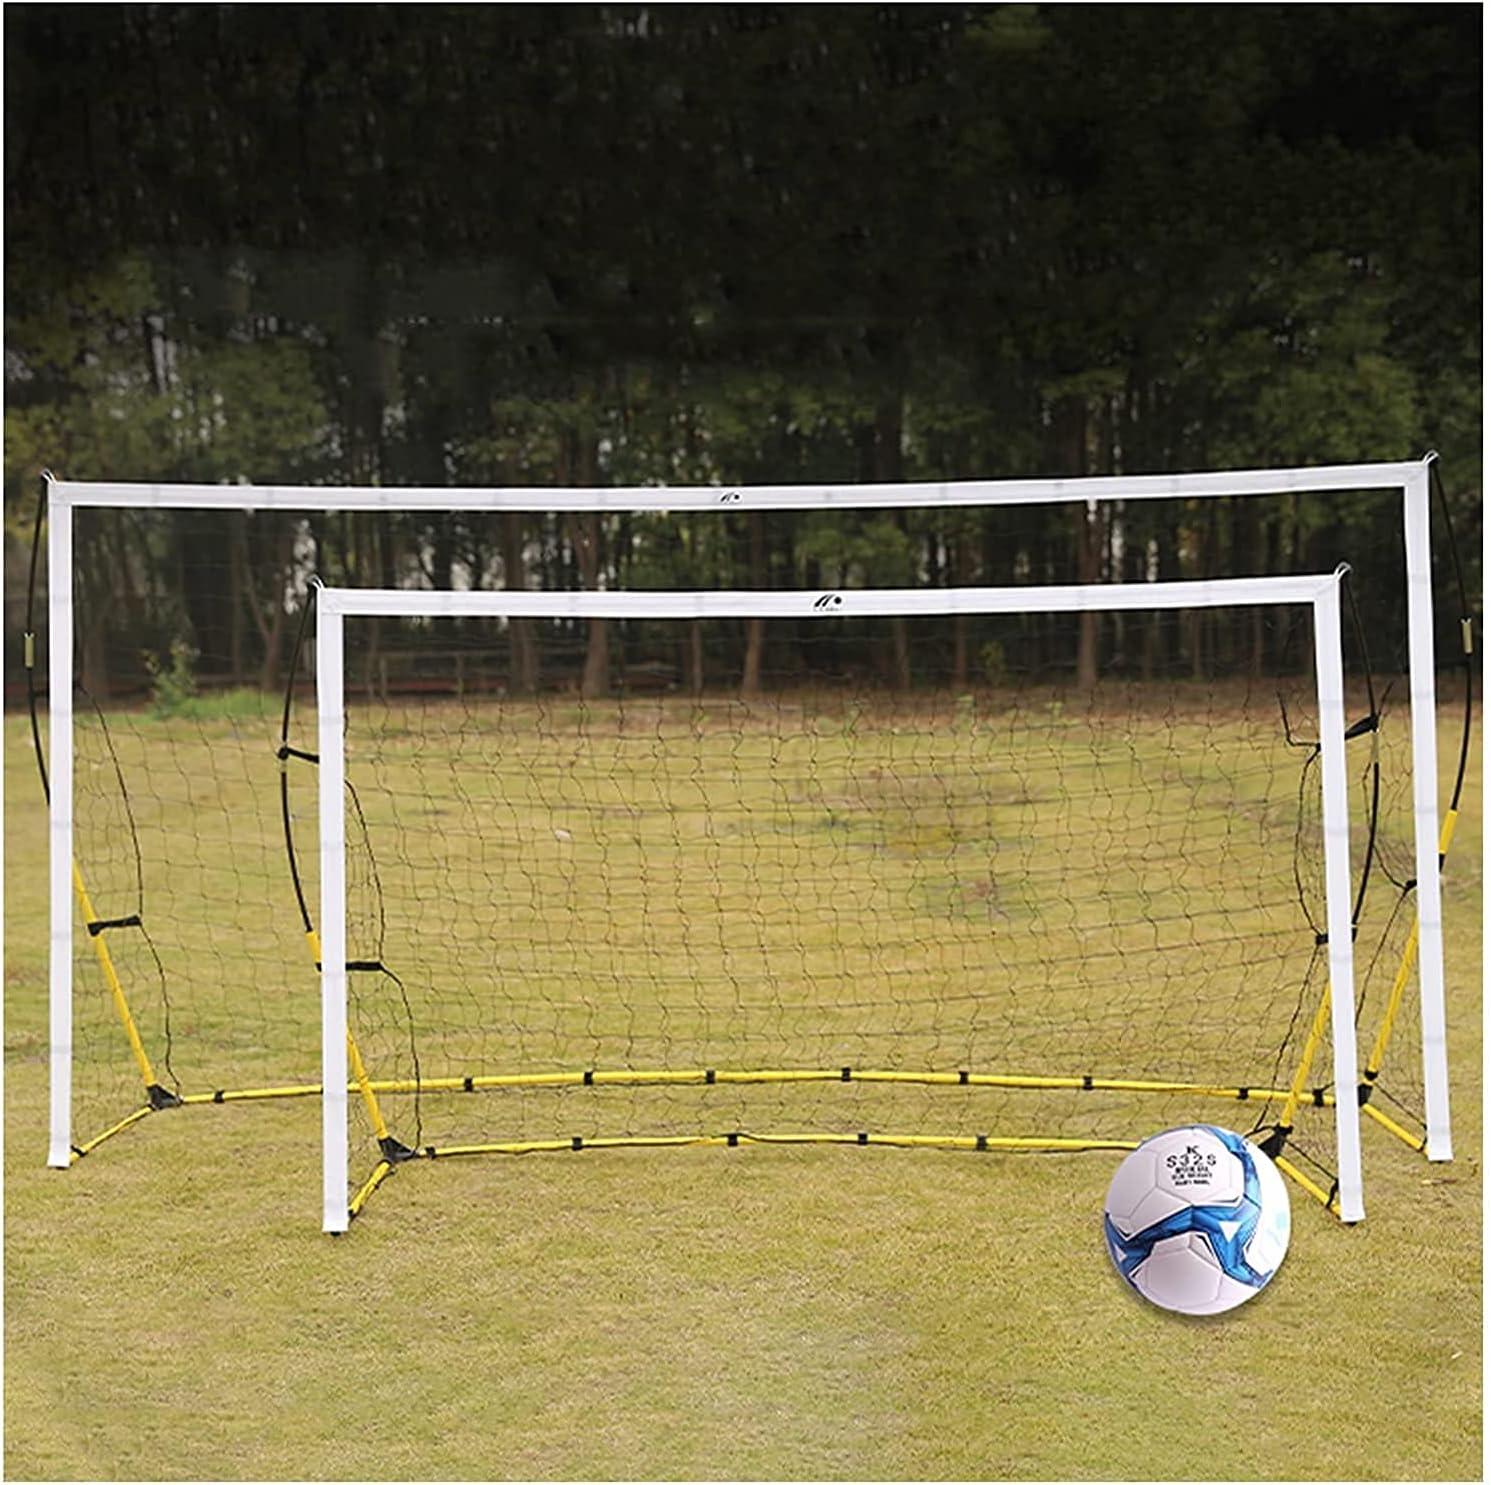 Zheshitech Kids Sacramento Mall Soccer Net Portable Goals 67% OFF of fixed price Foldable